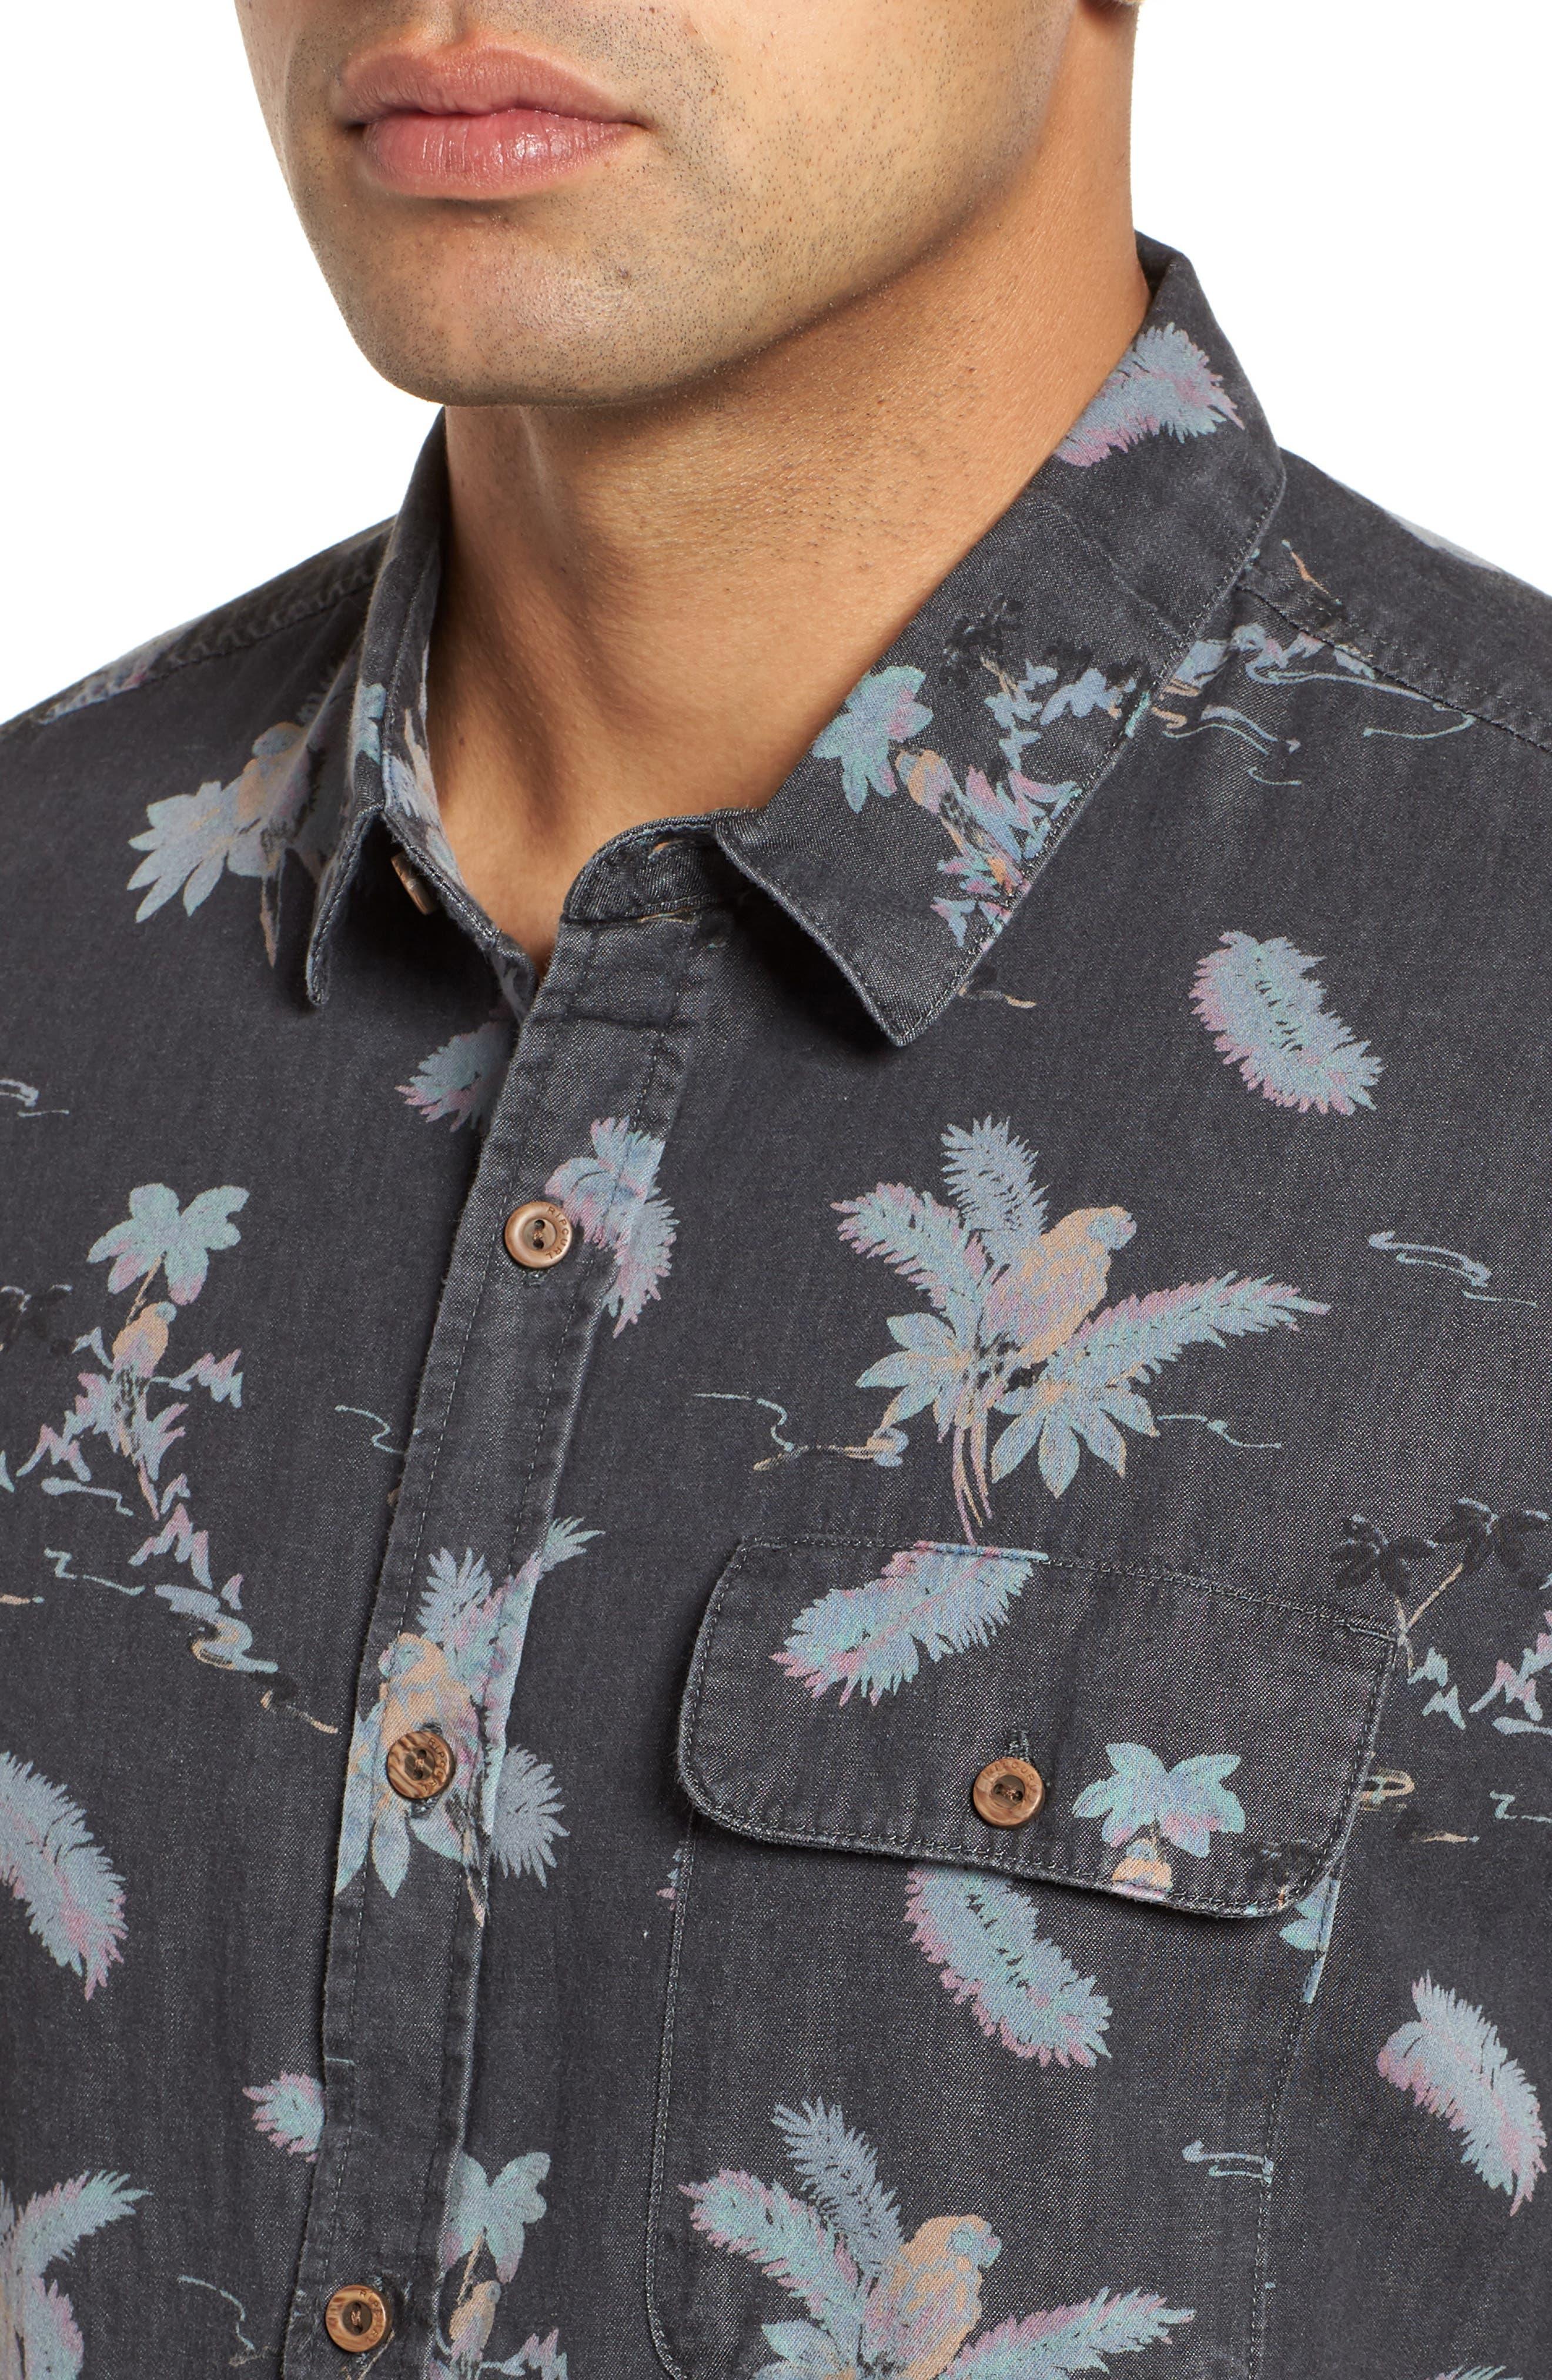 Meledrone Woven Shirt,                             Alternate thumbnail 2, color,                             Charcoal Grey